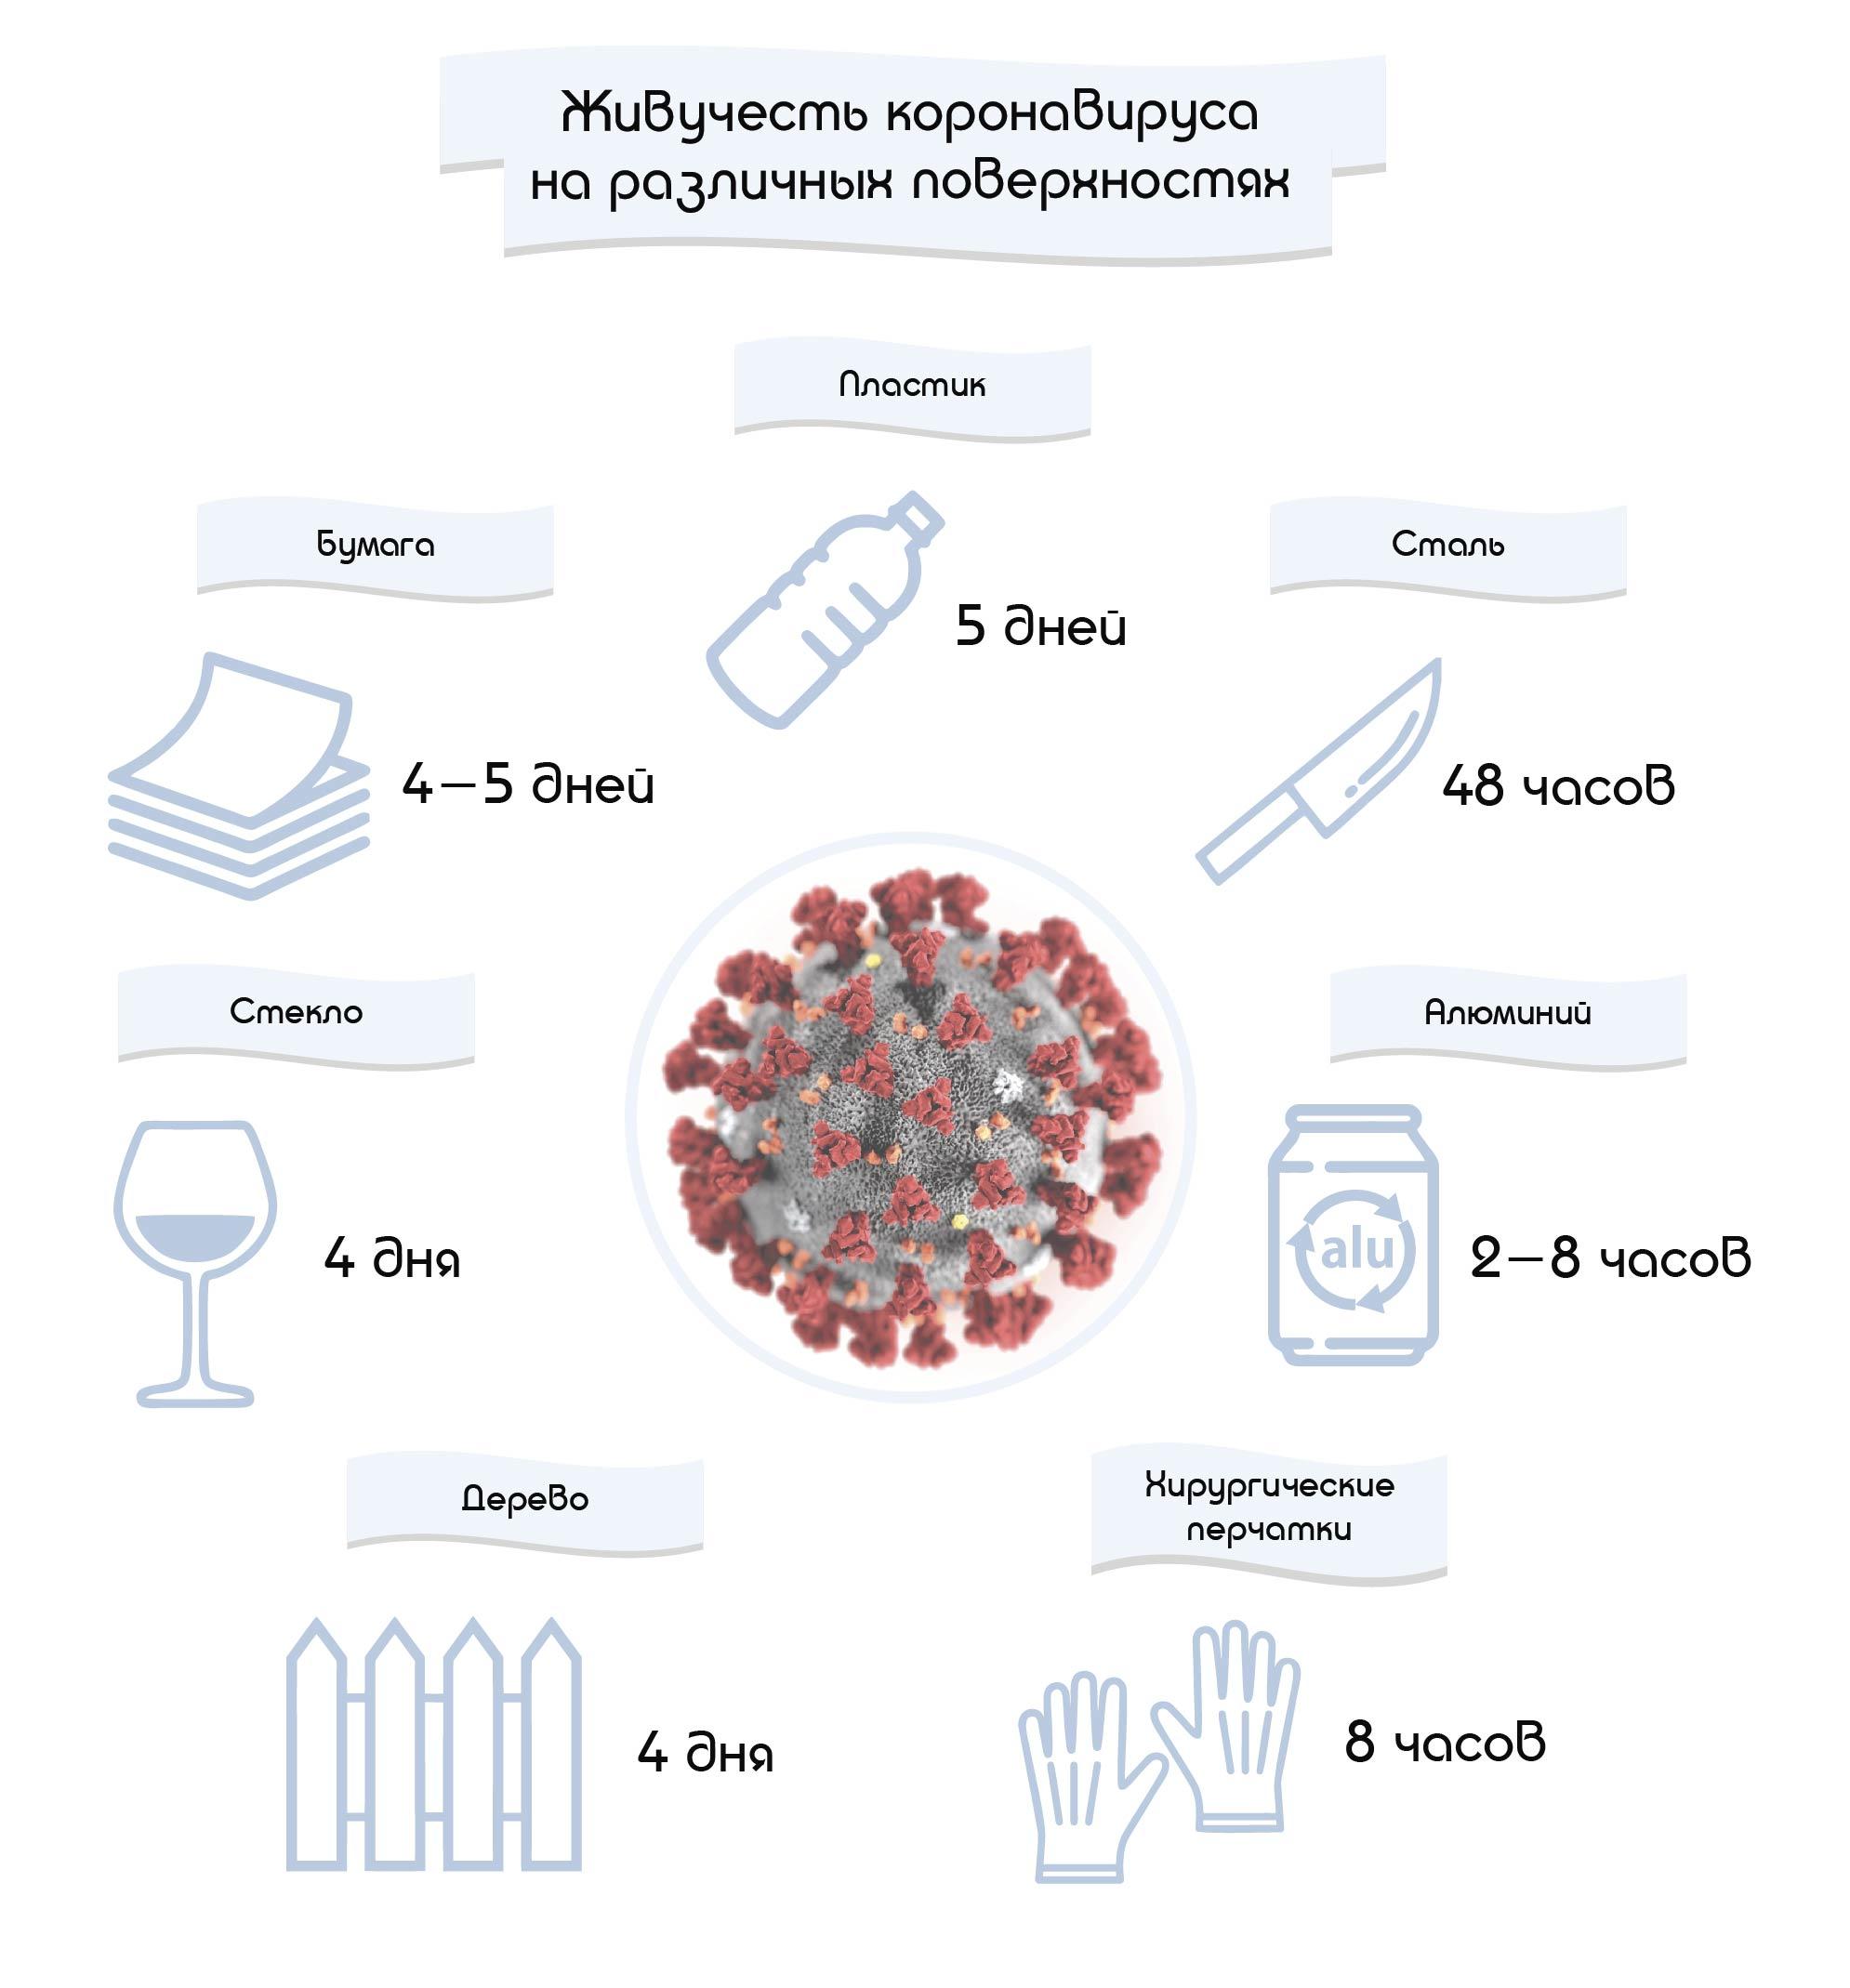 zhivuchest-koronavirusa